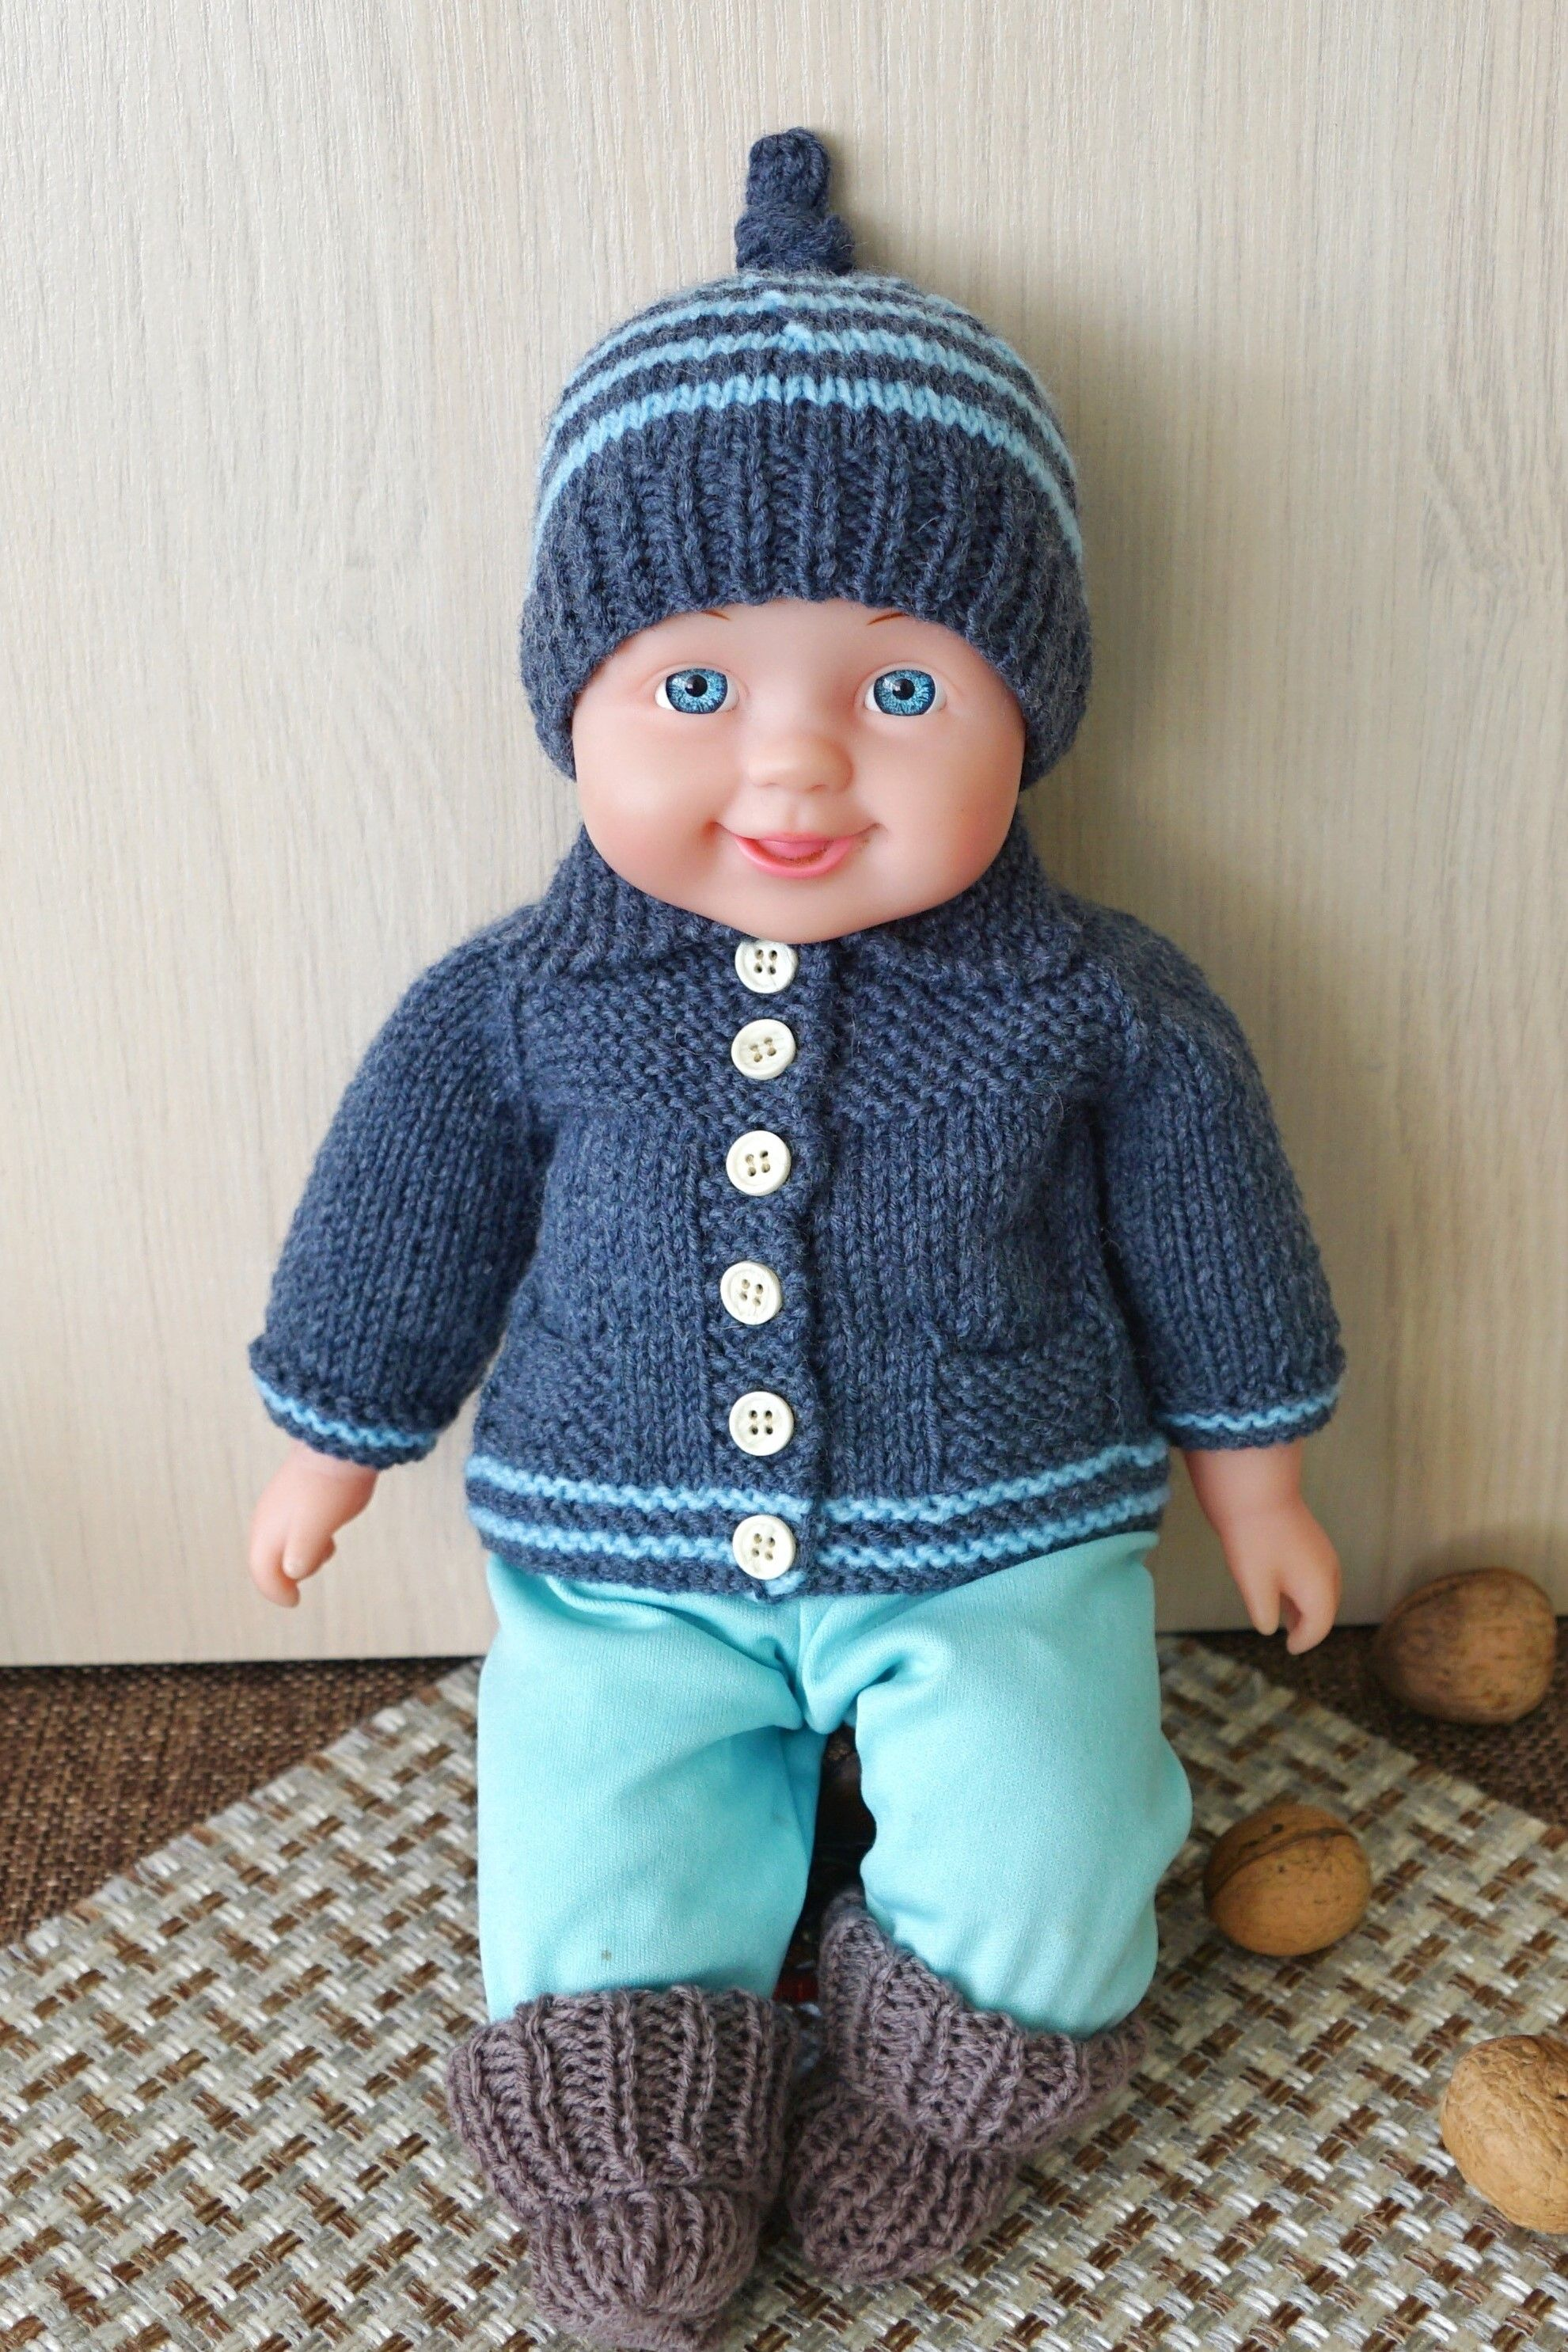 Boy doll clothing set, blue knitted cardigan, blue hat